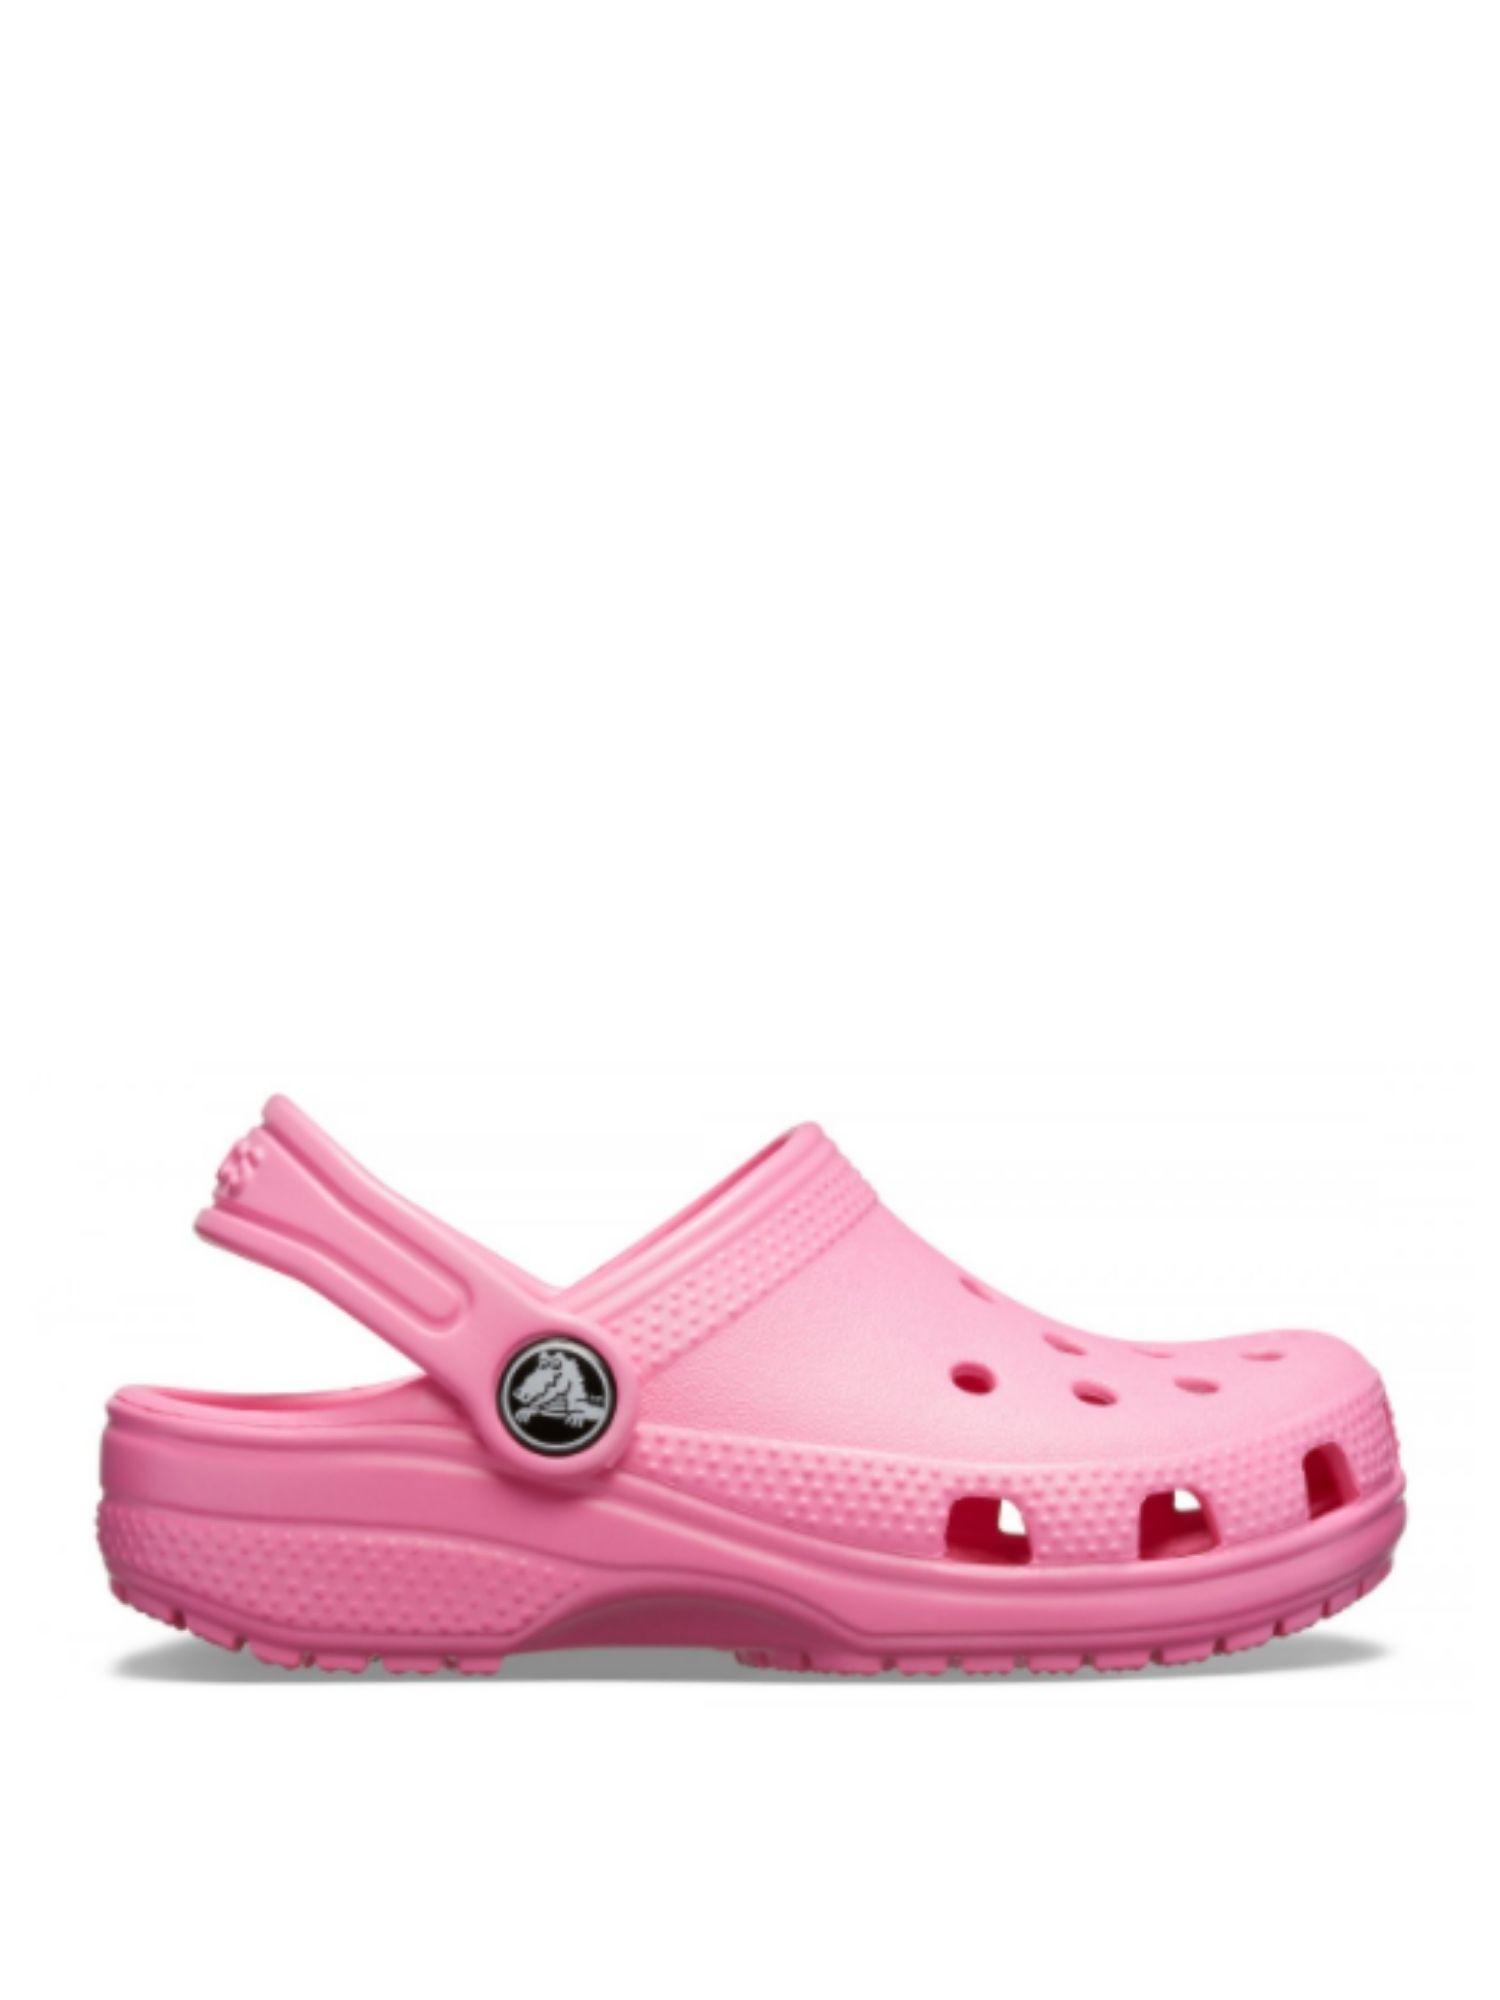 Sabot Crocs Bambino Classic Clog K 204536 Pink Lemonade lato